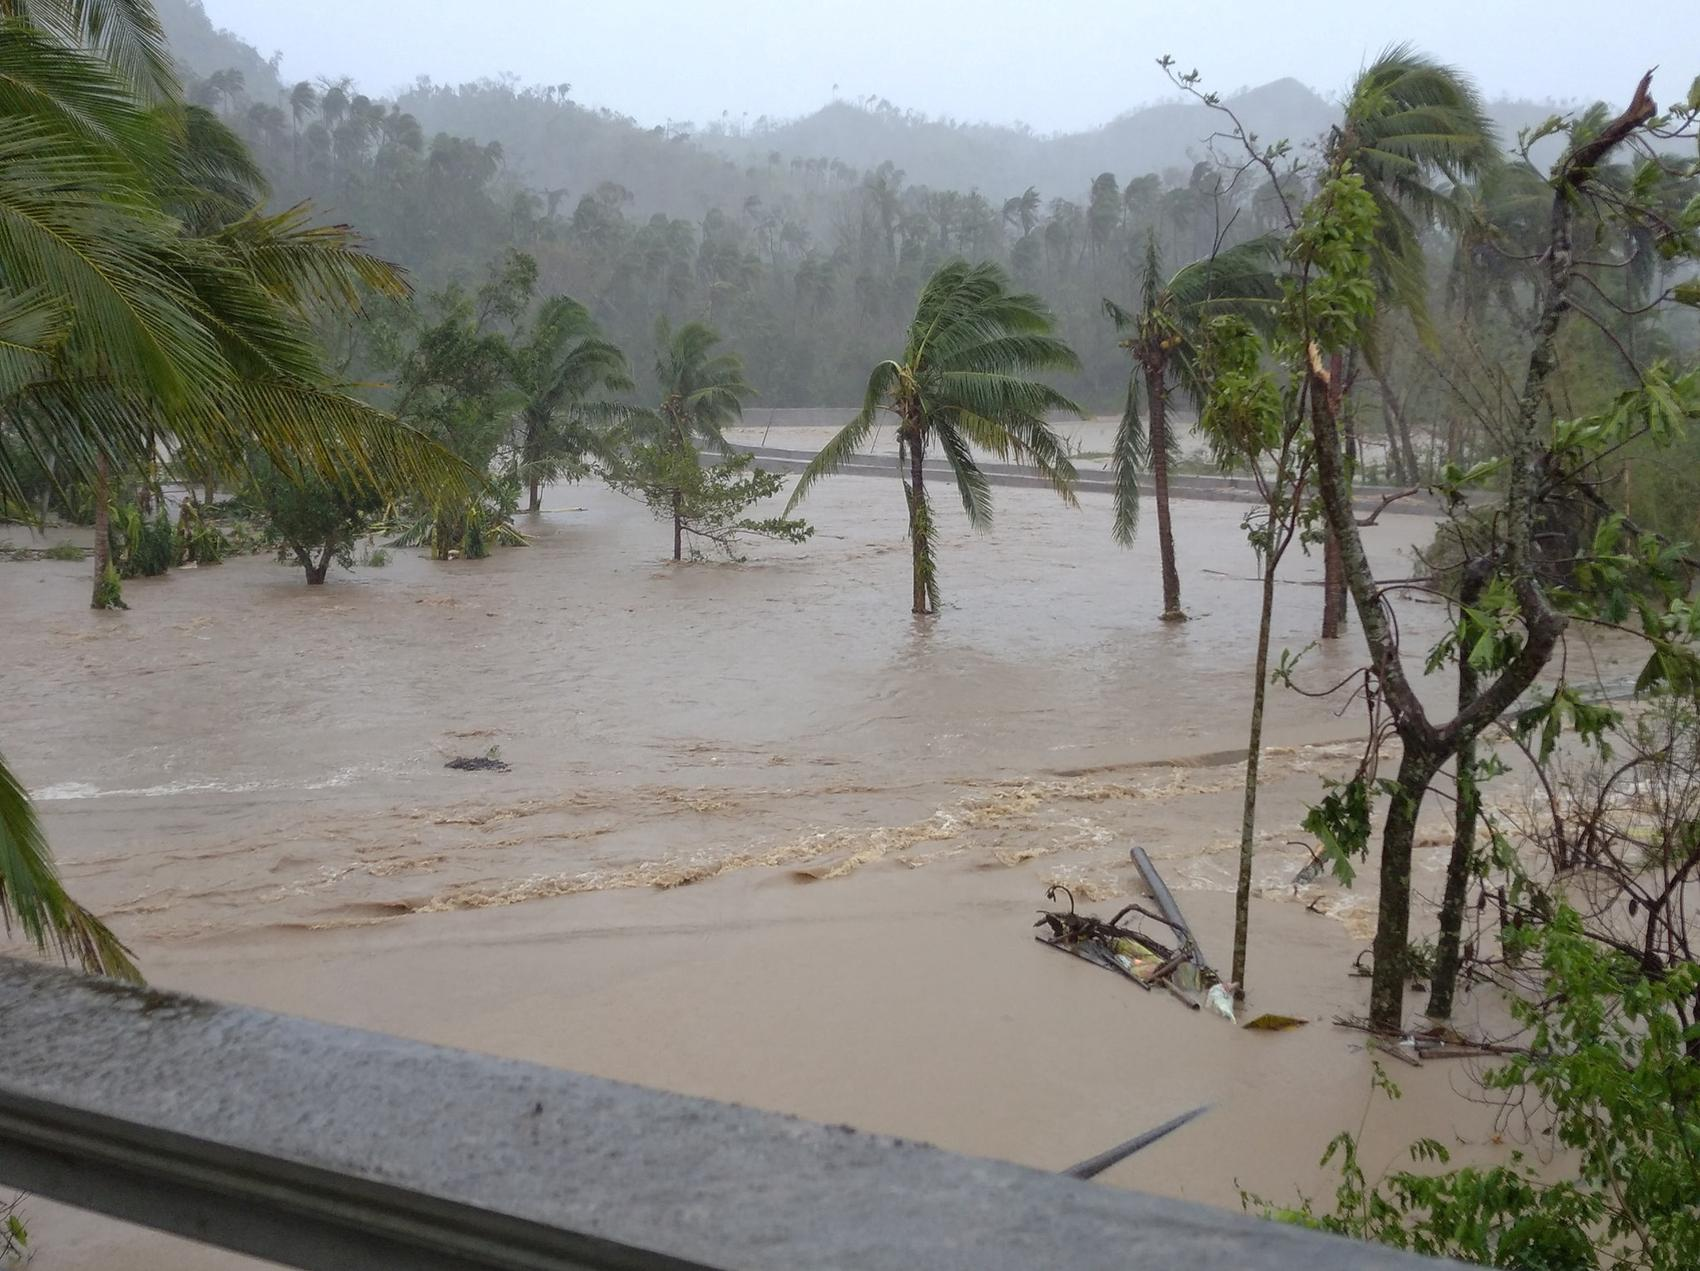 Typhoon Goni weakens as it crosses Philippines, four dead